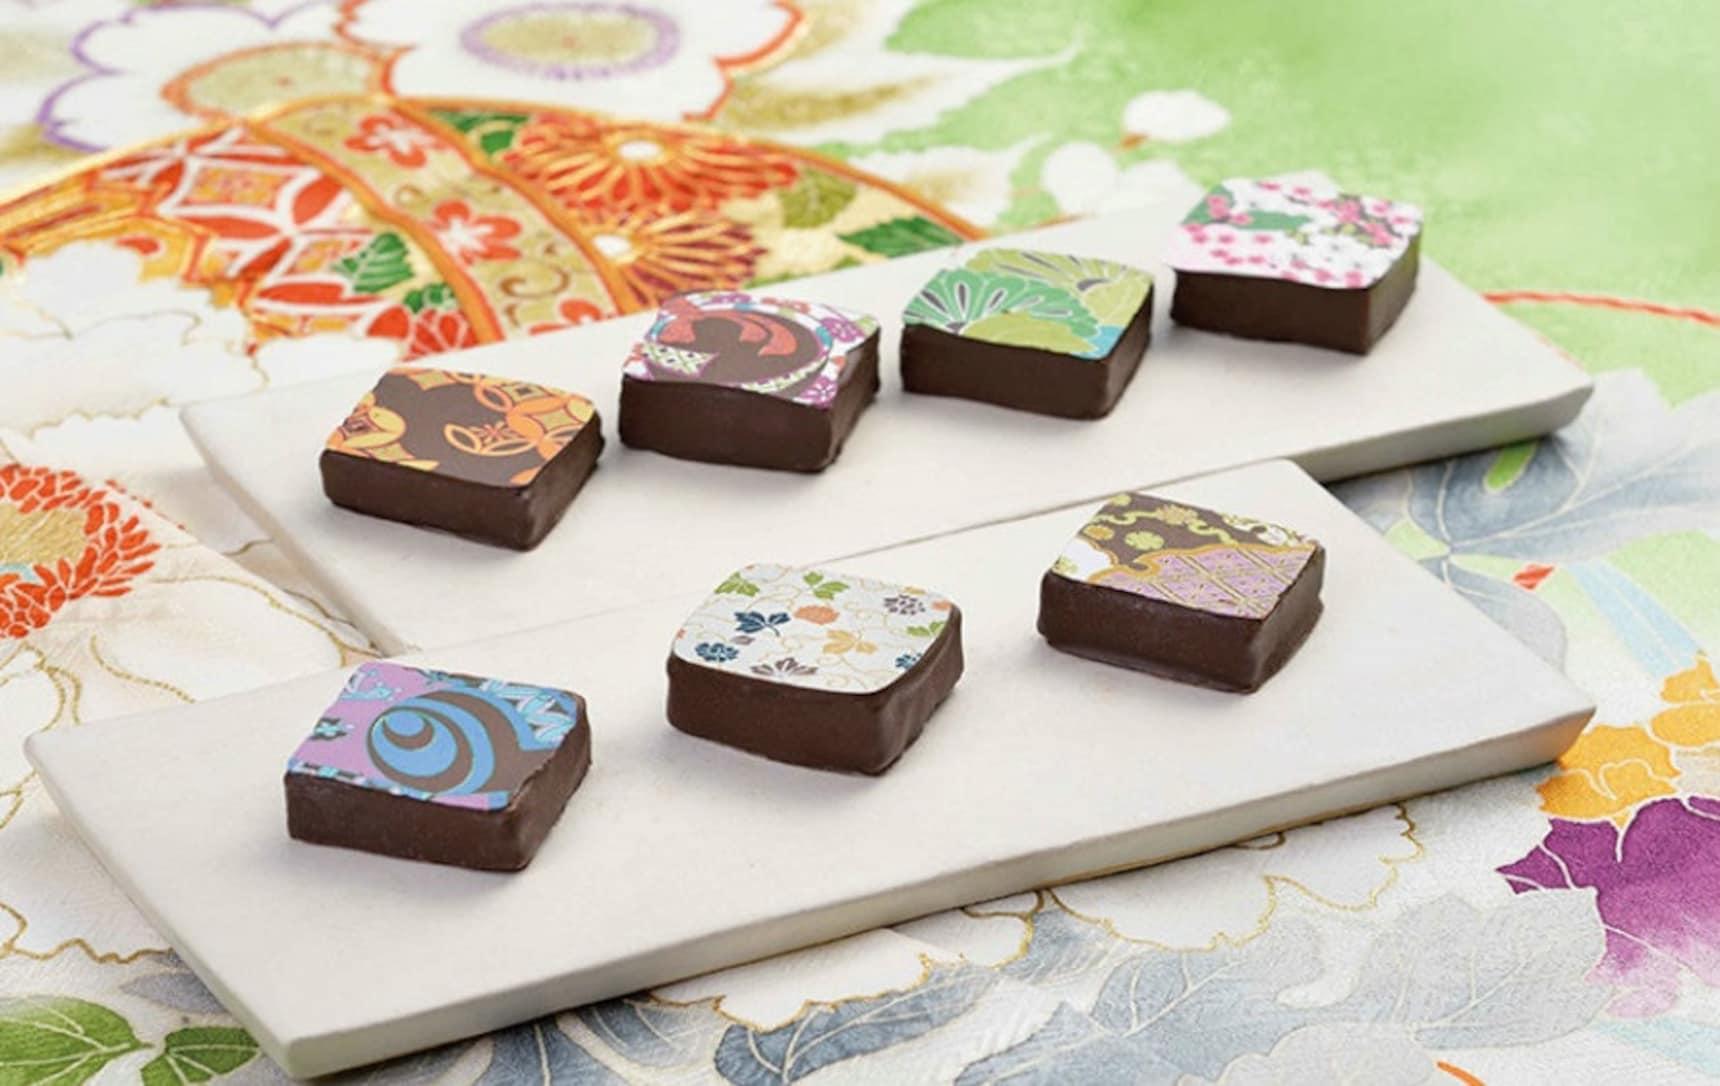 A Sweet Mixture of Chocolate & Kimono Design